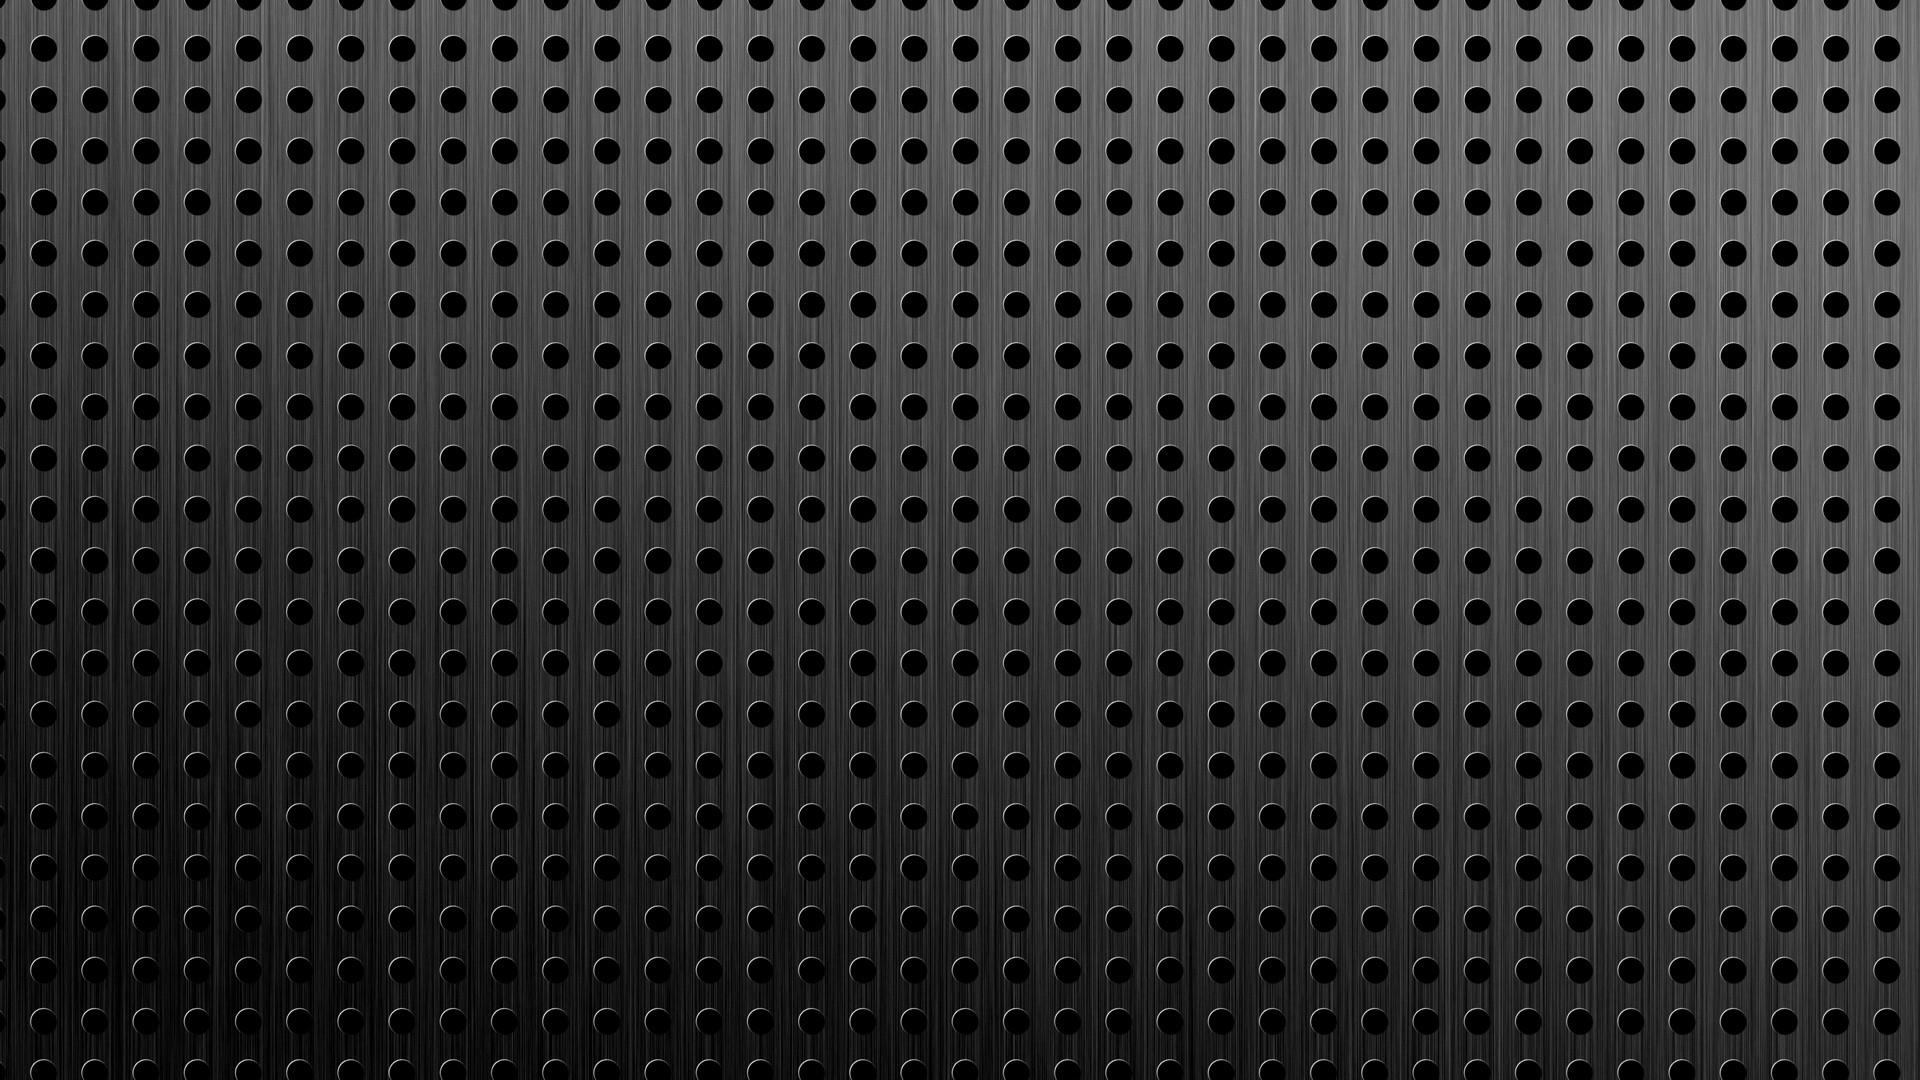 Monochrome Dark Pattern Metal Texture Circle Asphalt Background Net Material Design Floor Line Mesh Black And